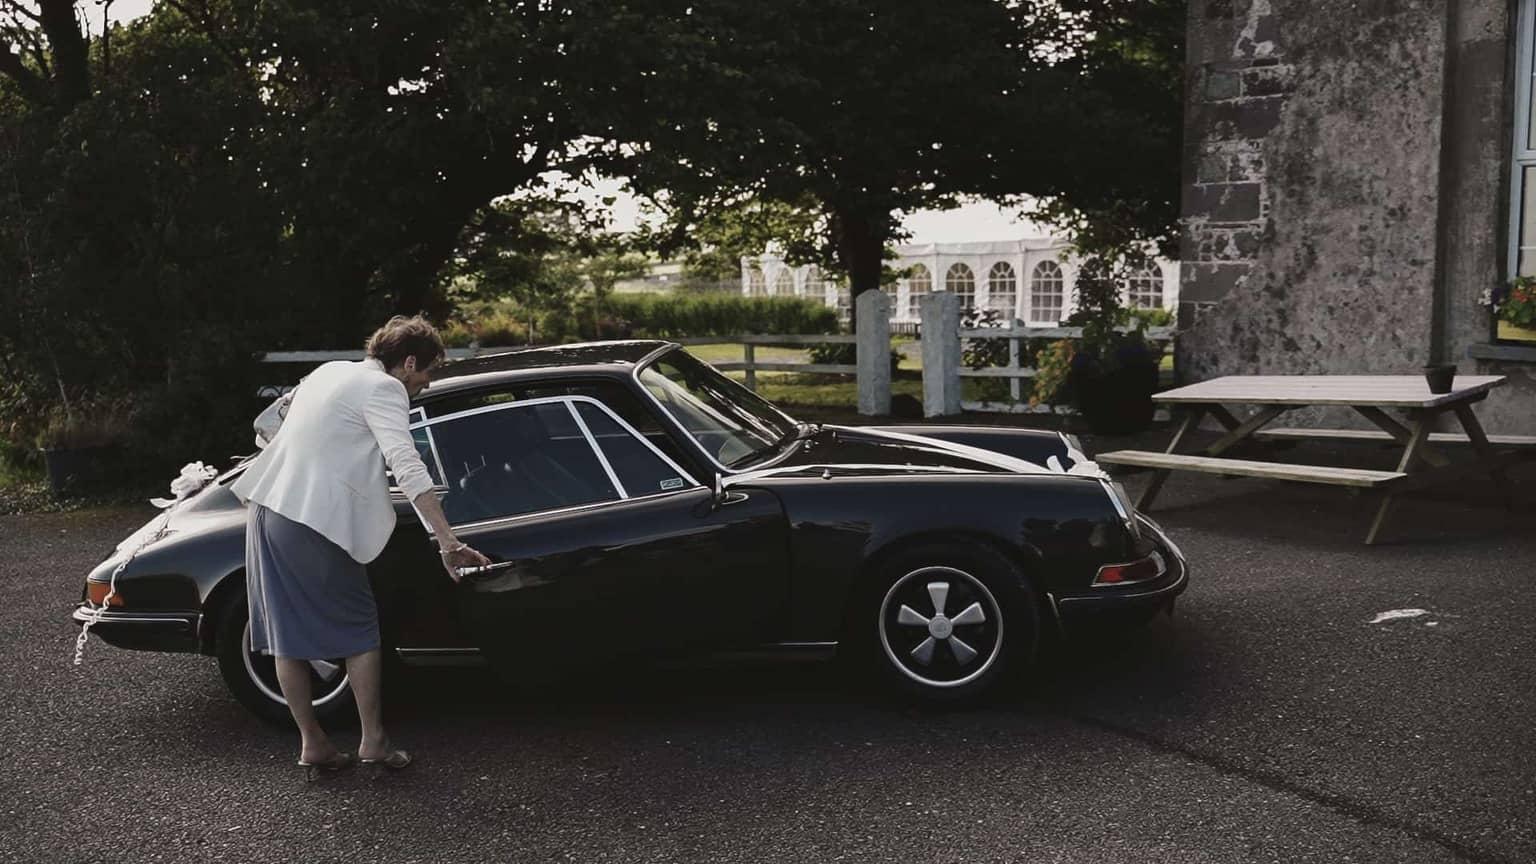 Grandmother is checking Porsche interior.